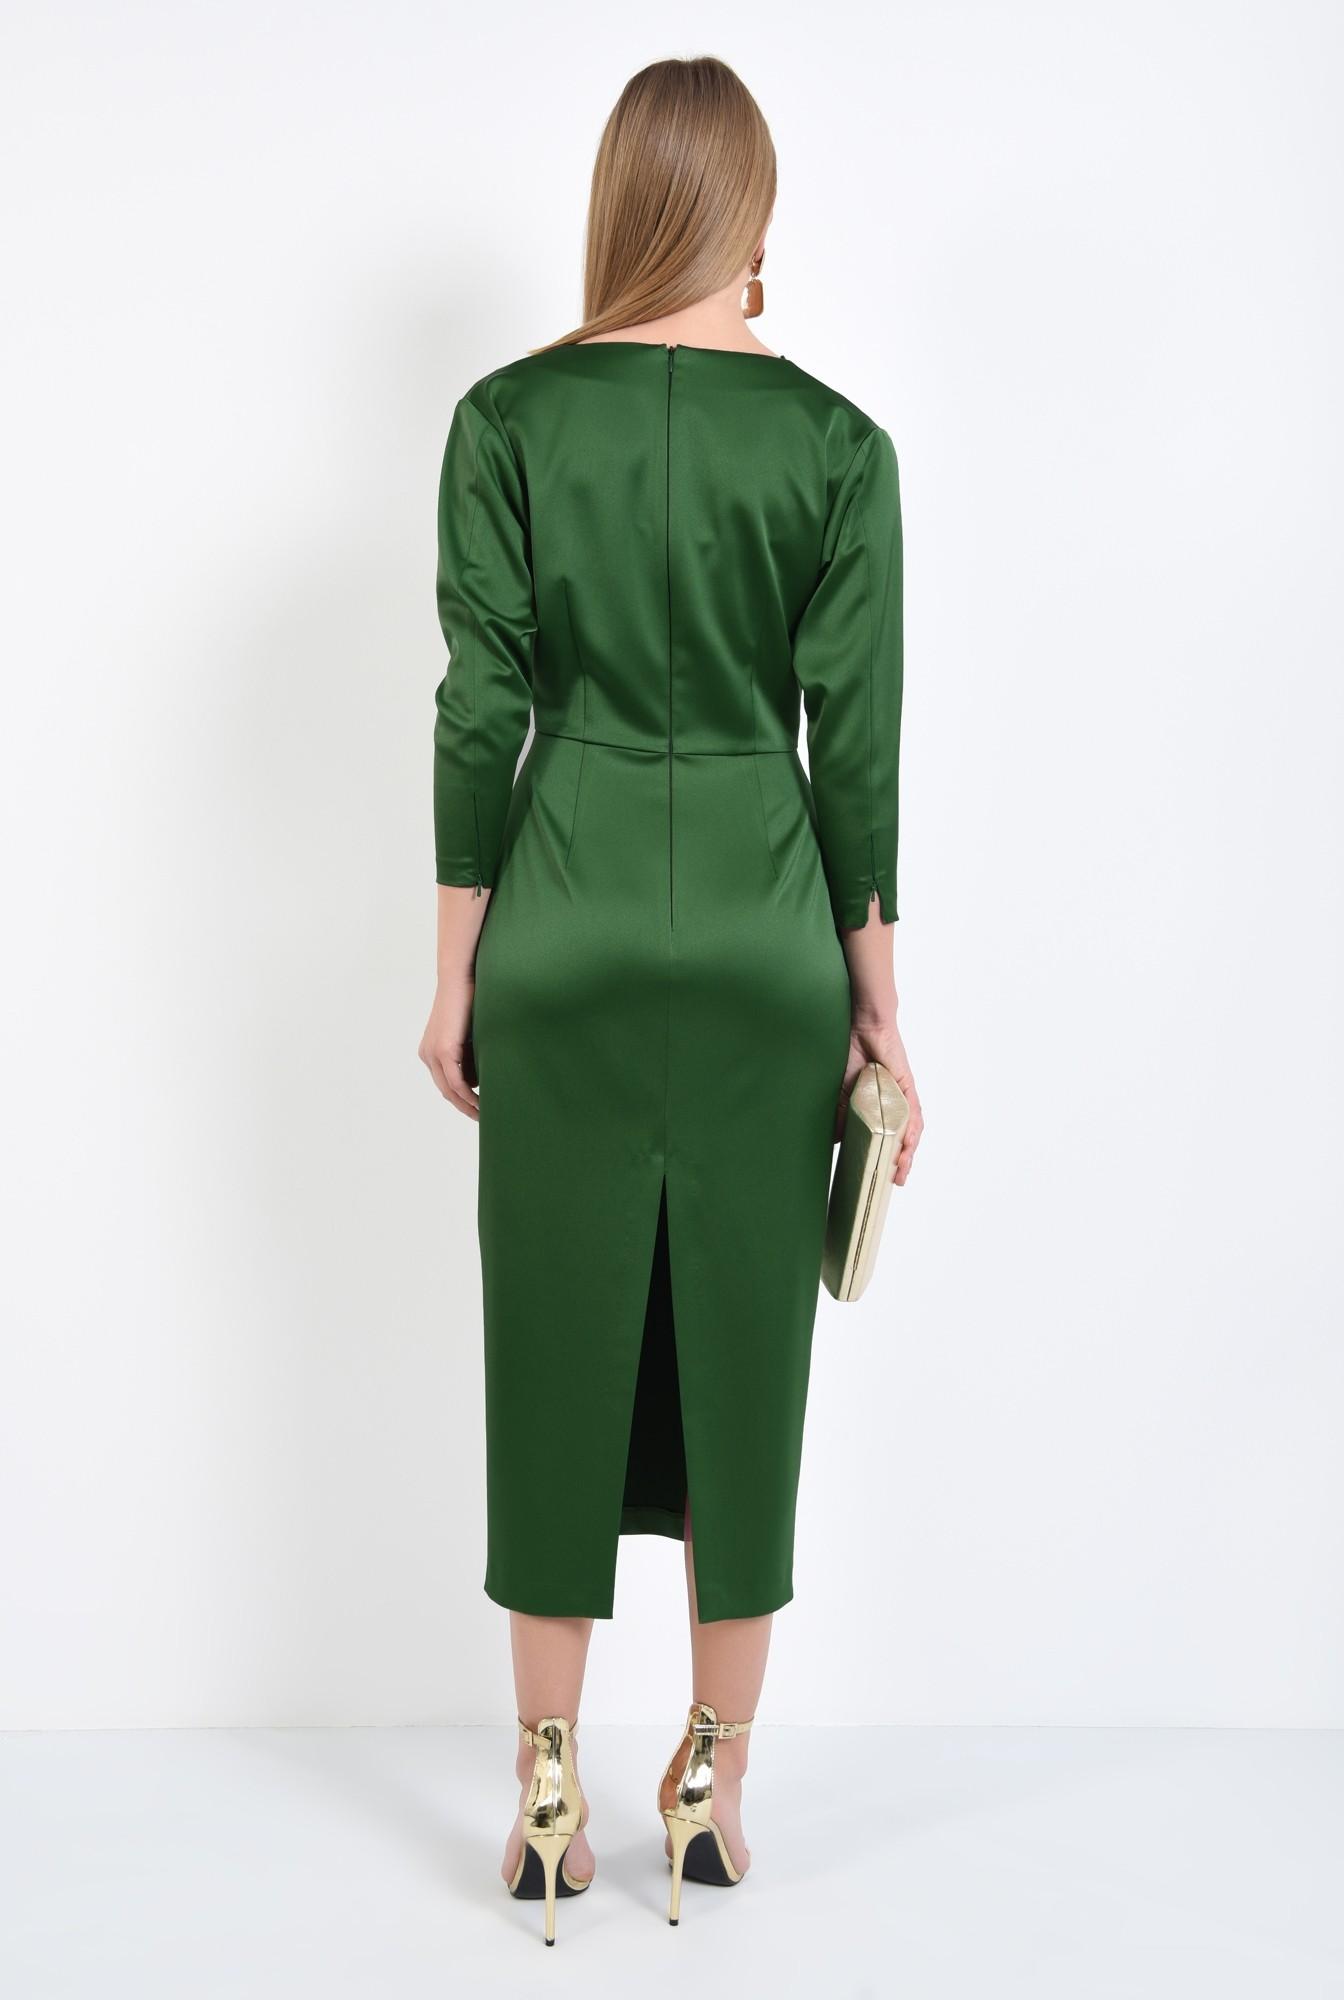 1 - rochie de ocazie, verde, maneci ajustate, drapata la decolteu